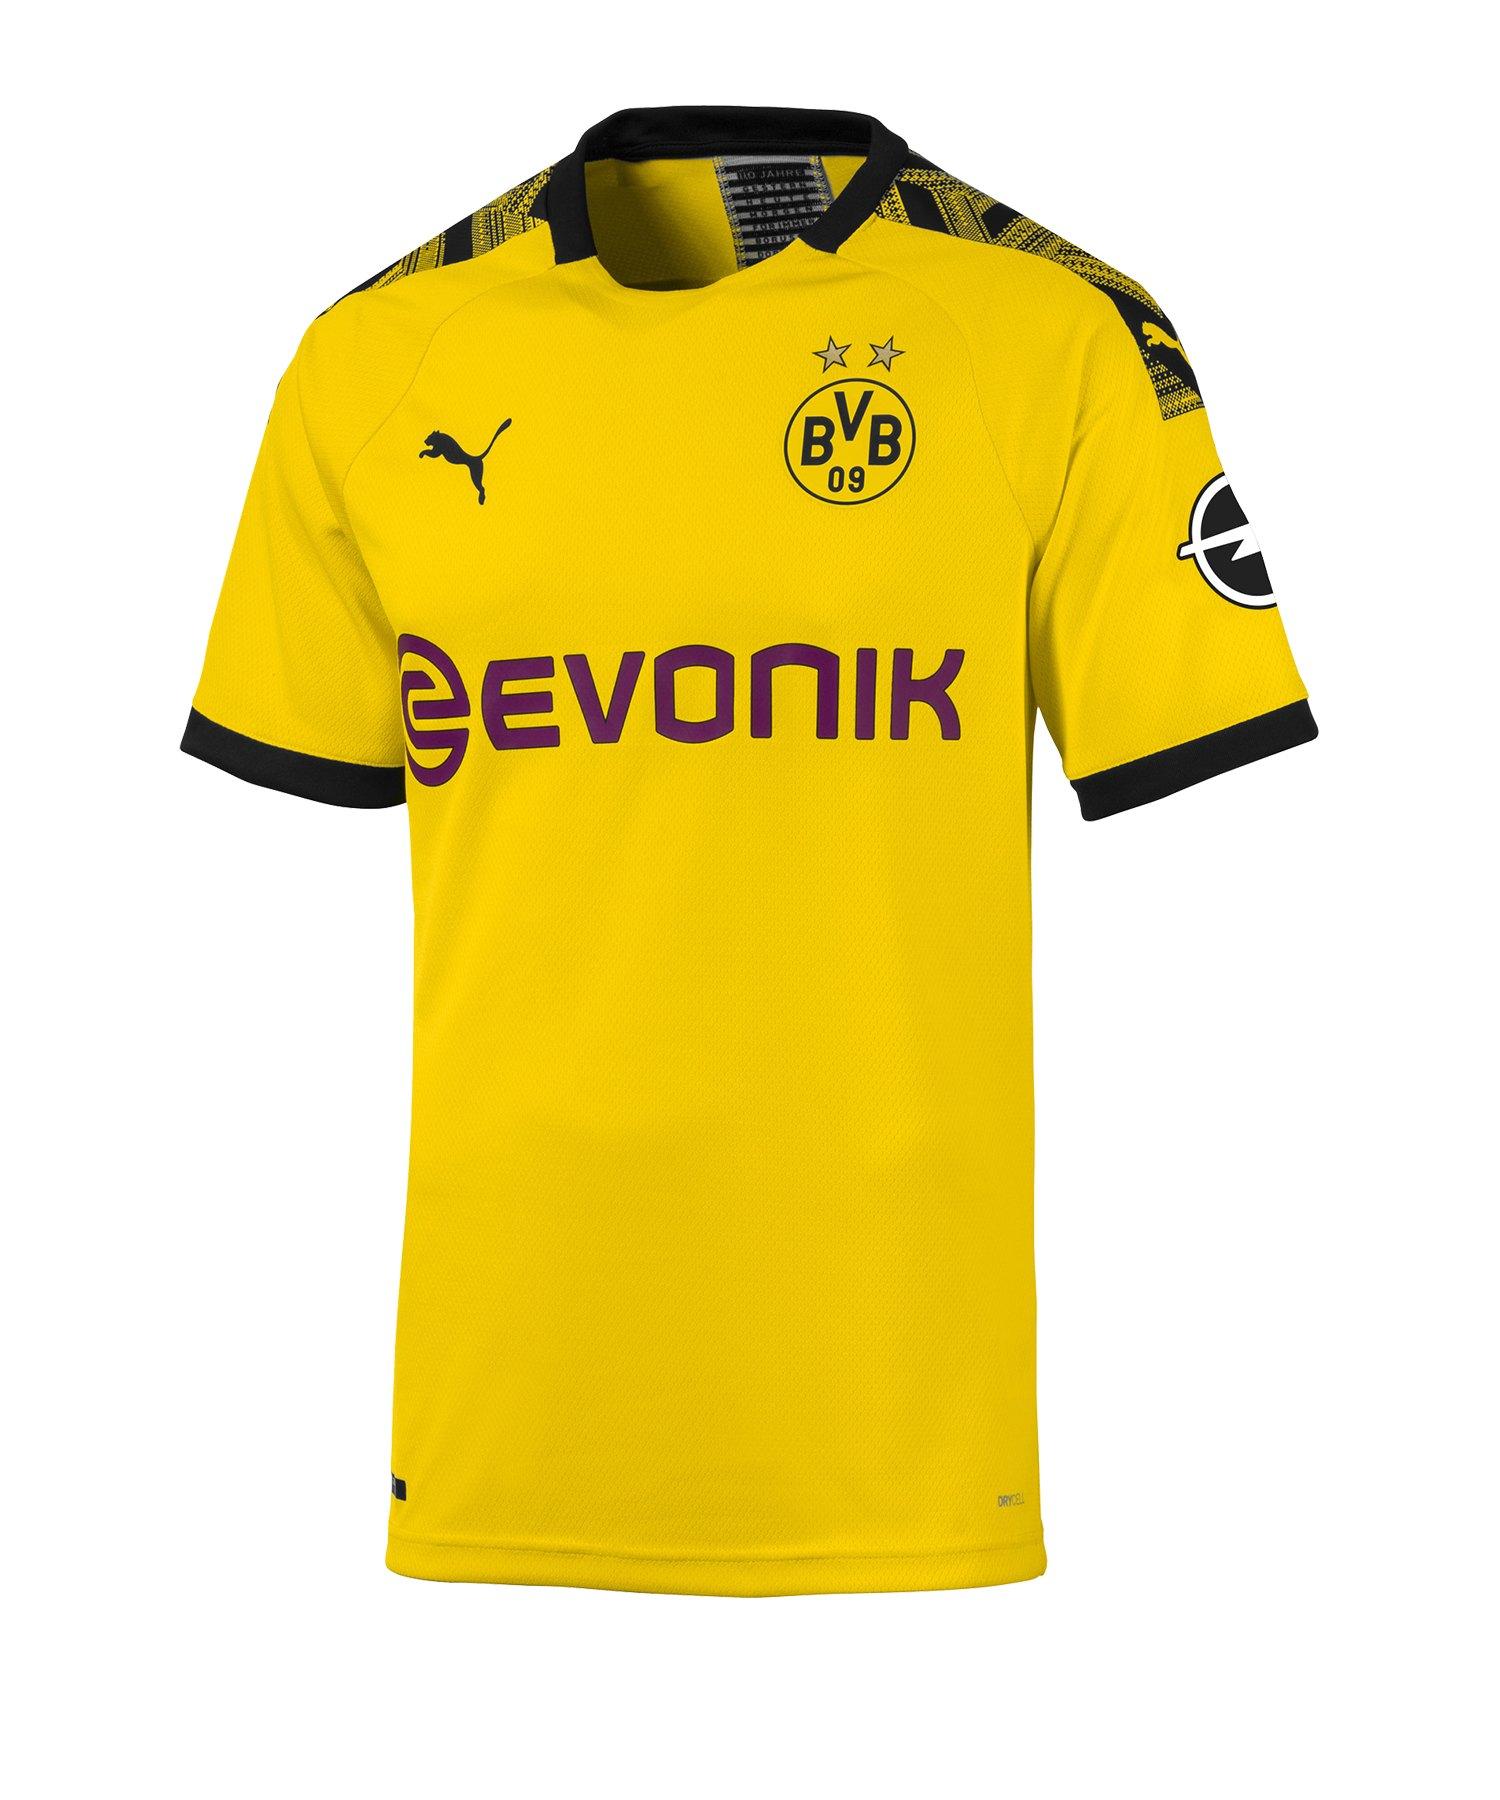 PUMA BVB Dortmund Auth. Trikot Home 2019/2020 F01 - Gelb